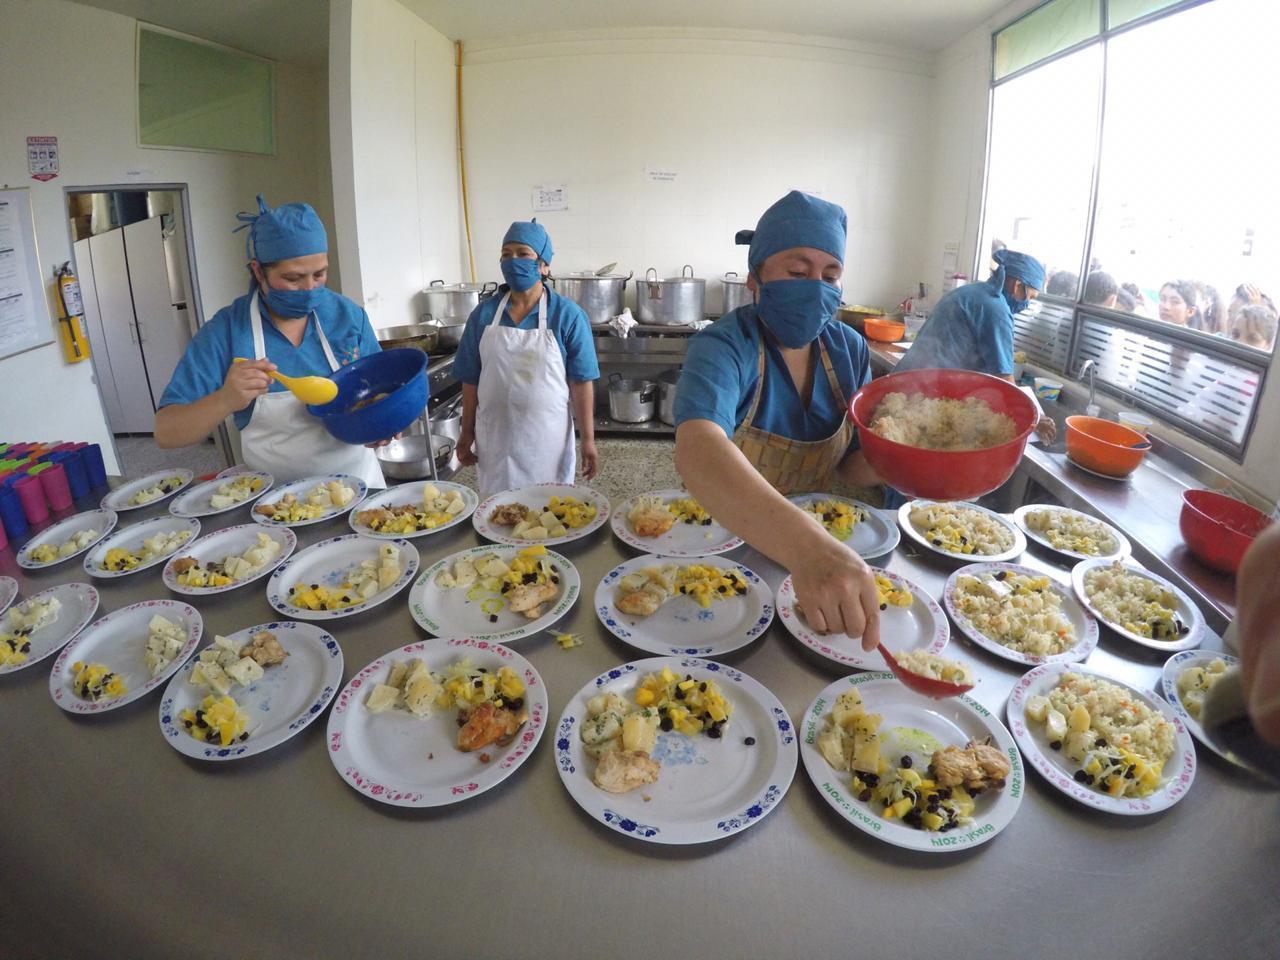 Gobernación de Boyacá refuerza seguimiento al Programa de Alimentación Escolar en Moniquirá